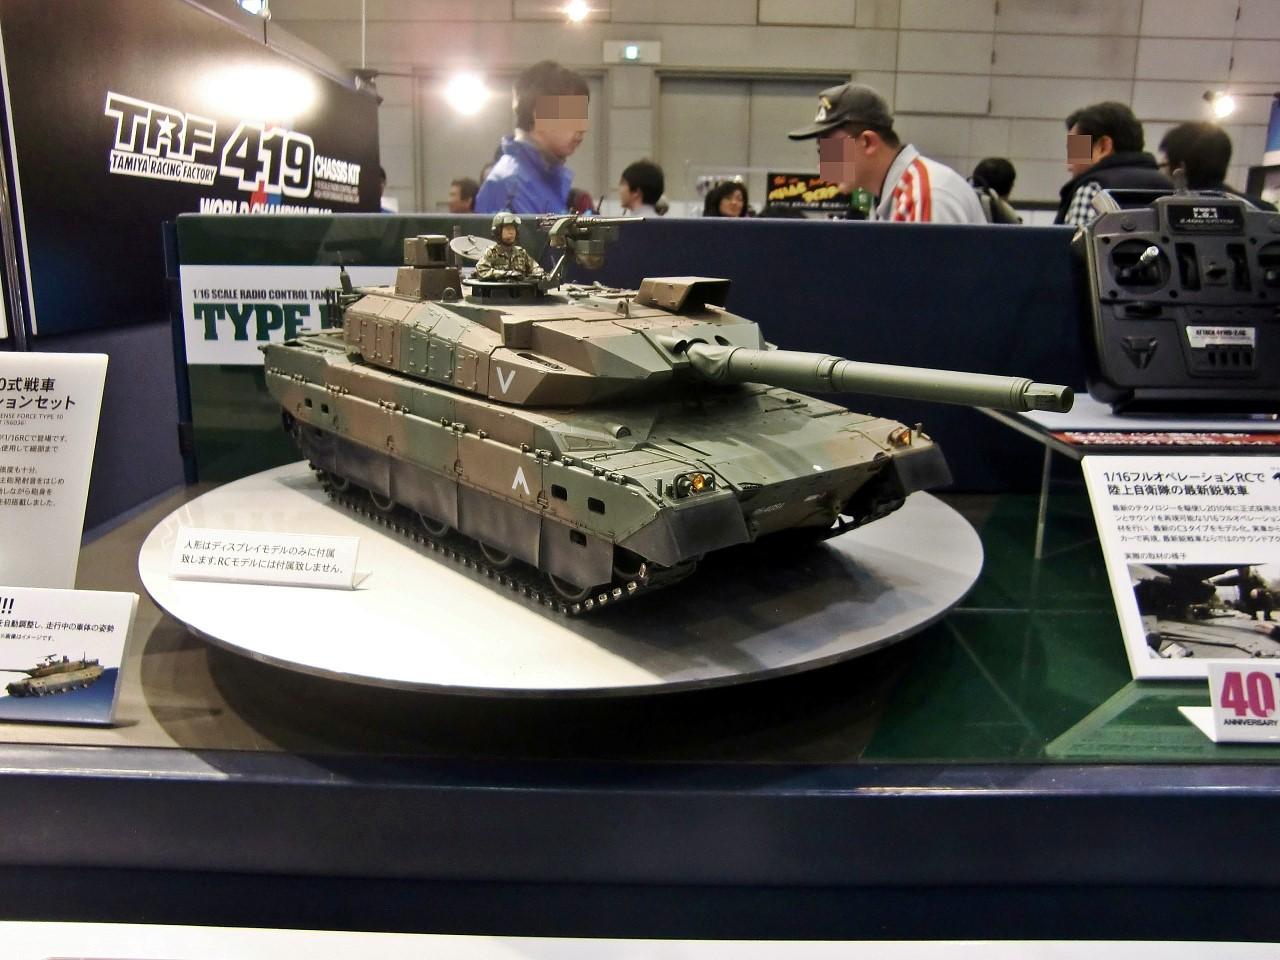 Il prossimo carro Tamiya - JGSDF Type 10  Attachment